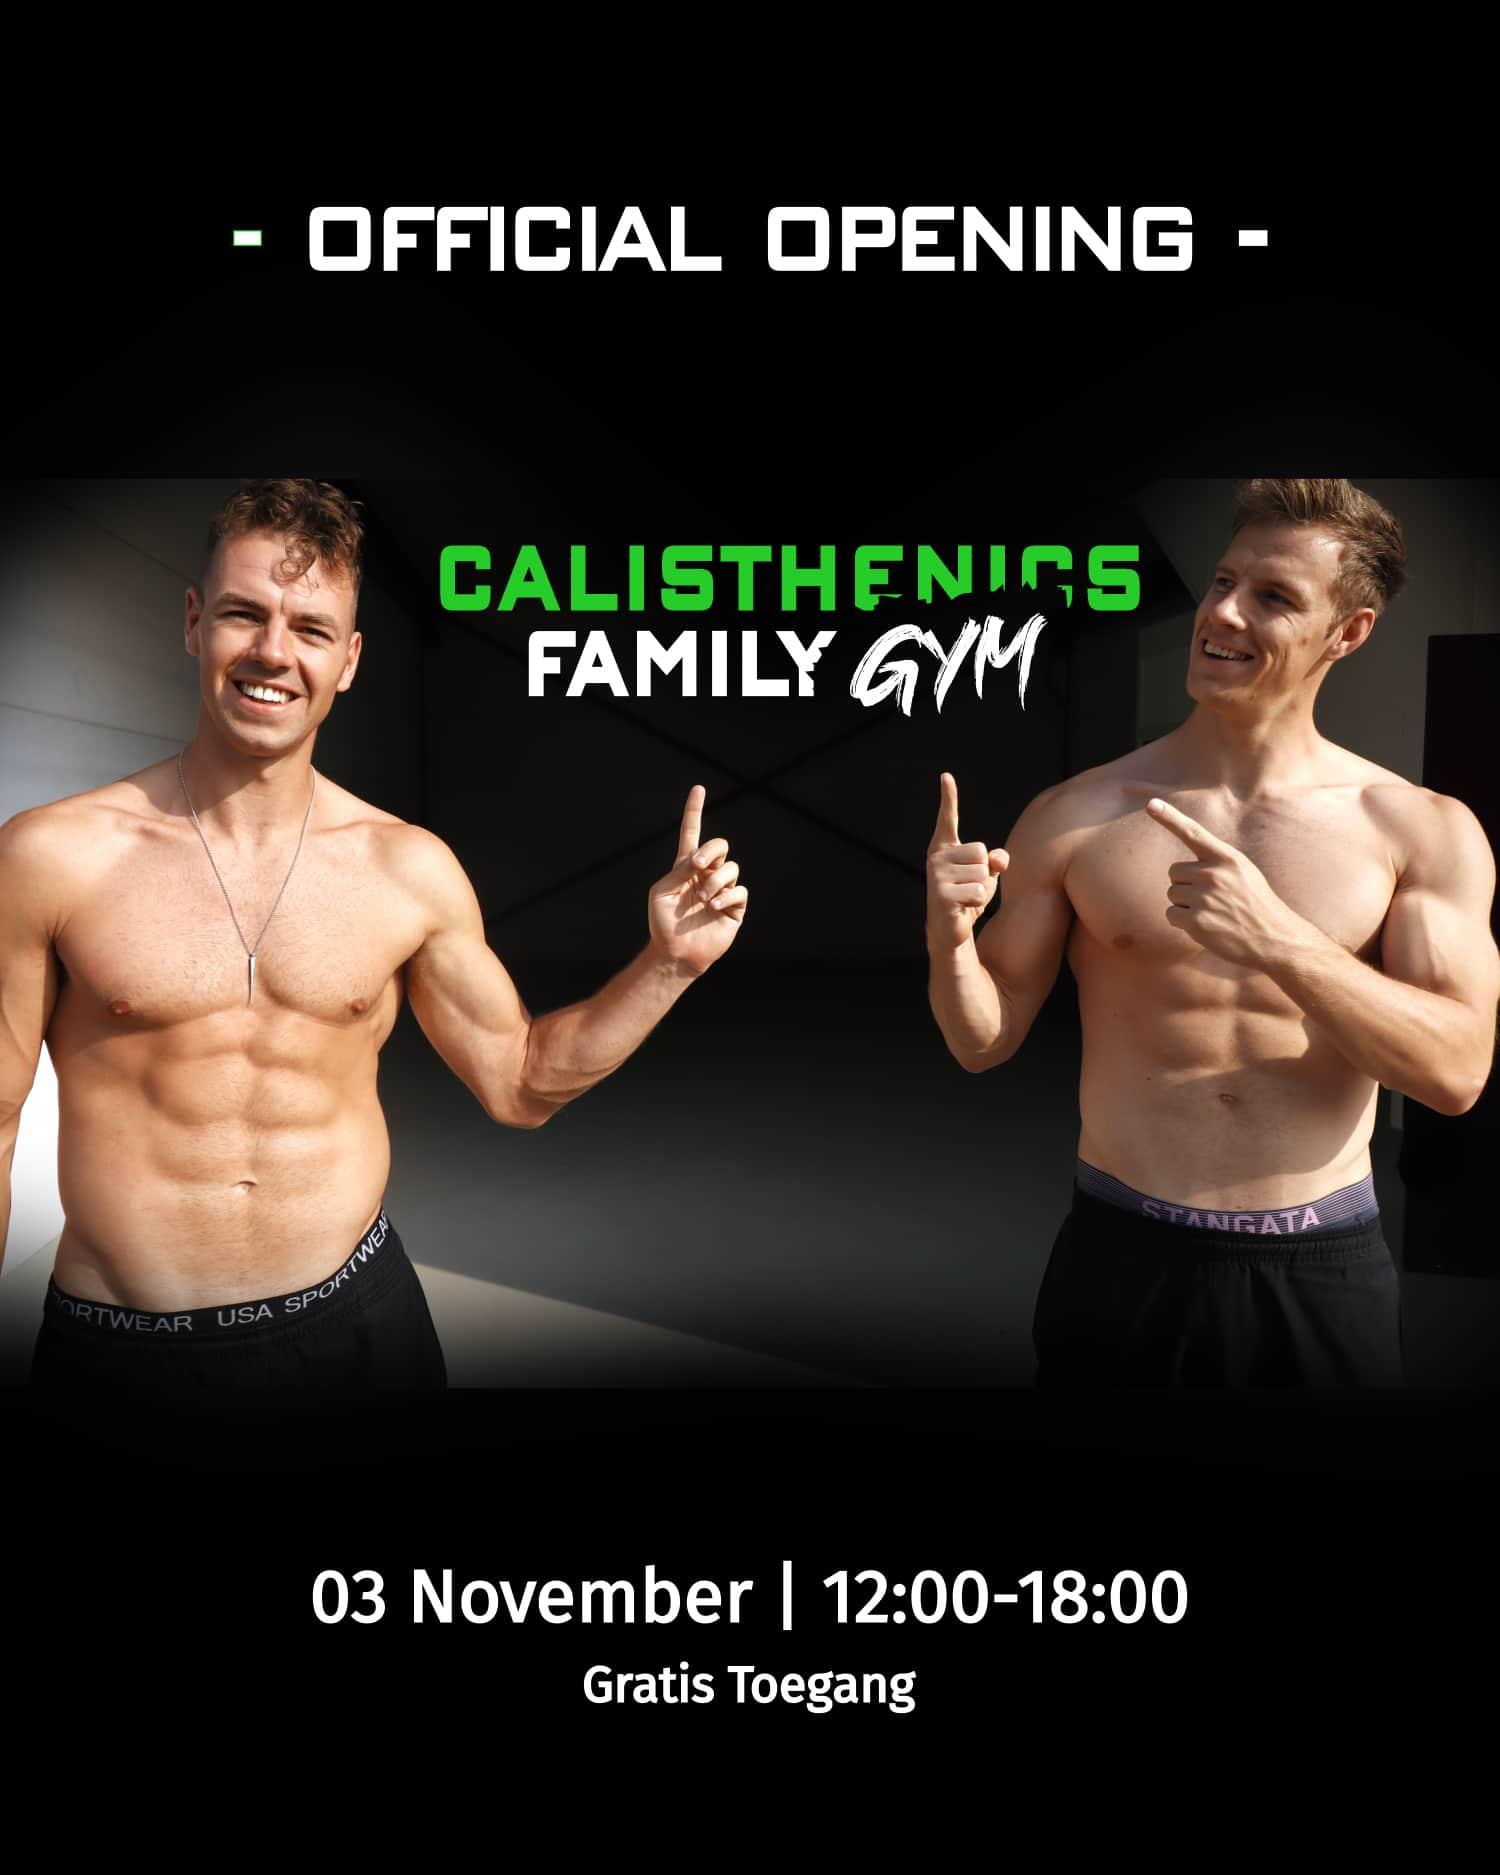 Calisthenics Family Gym